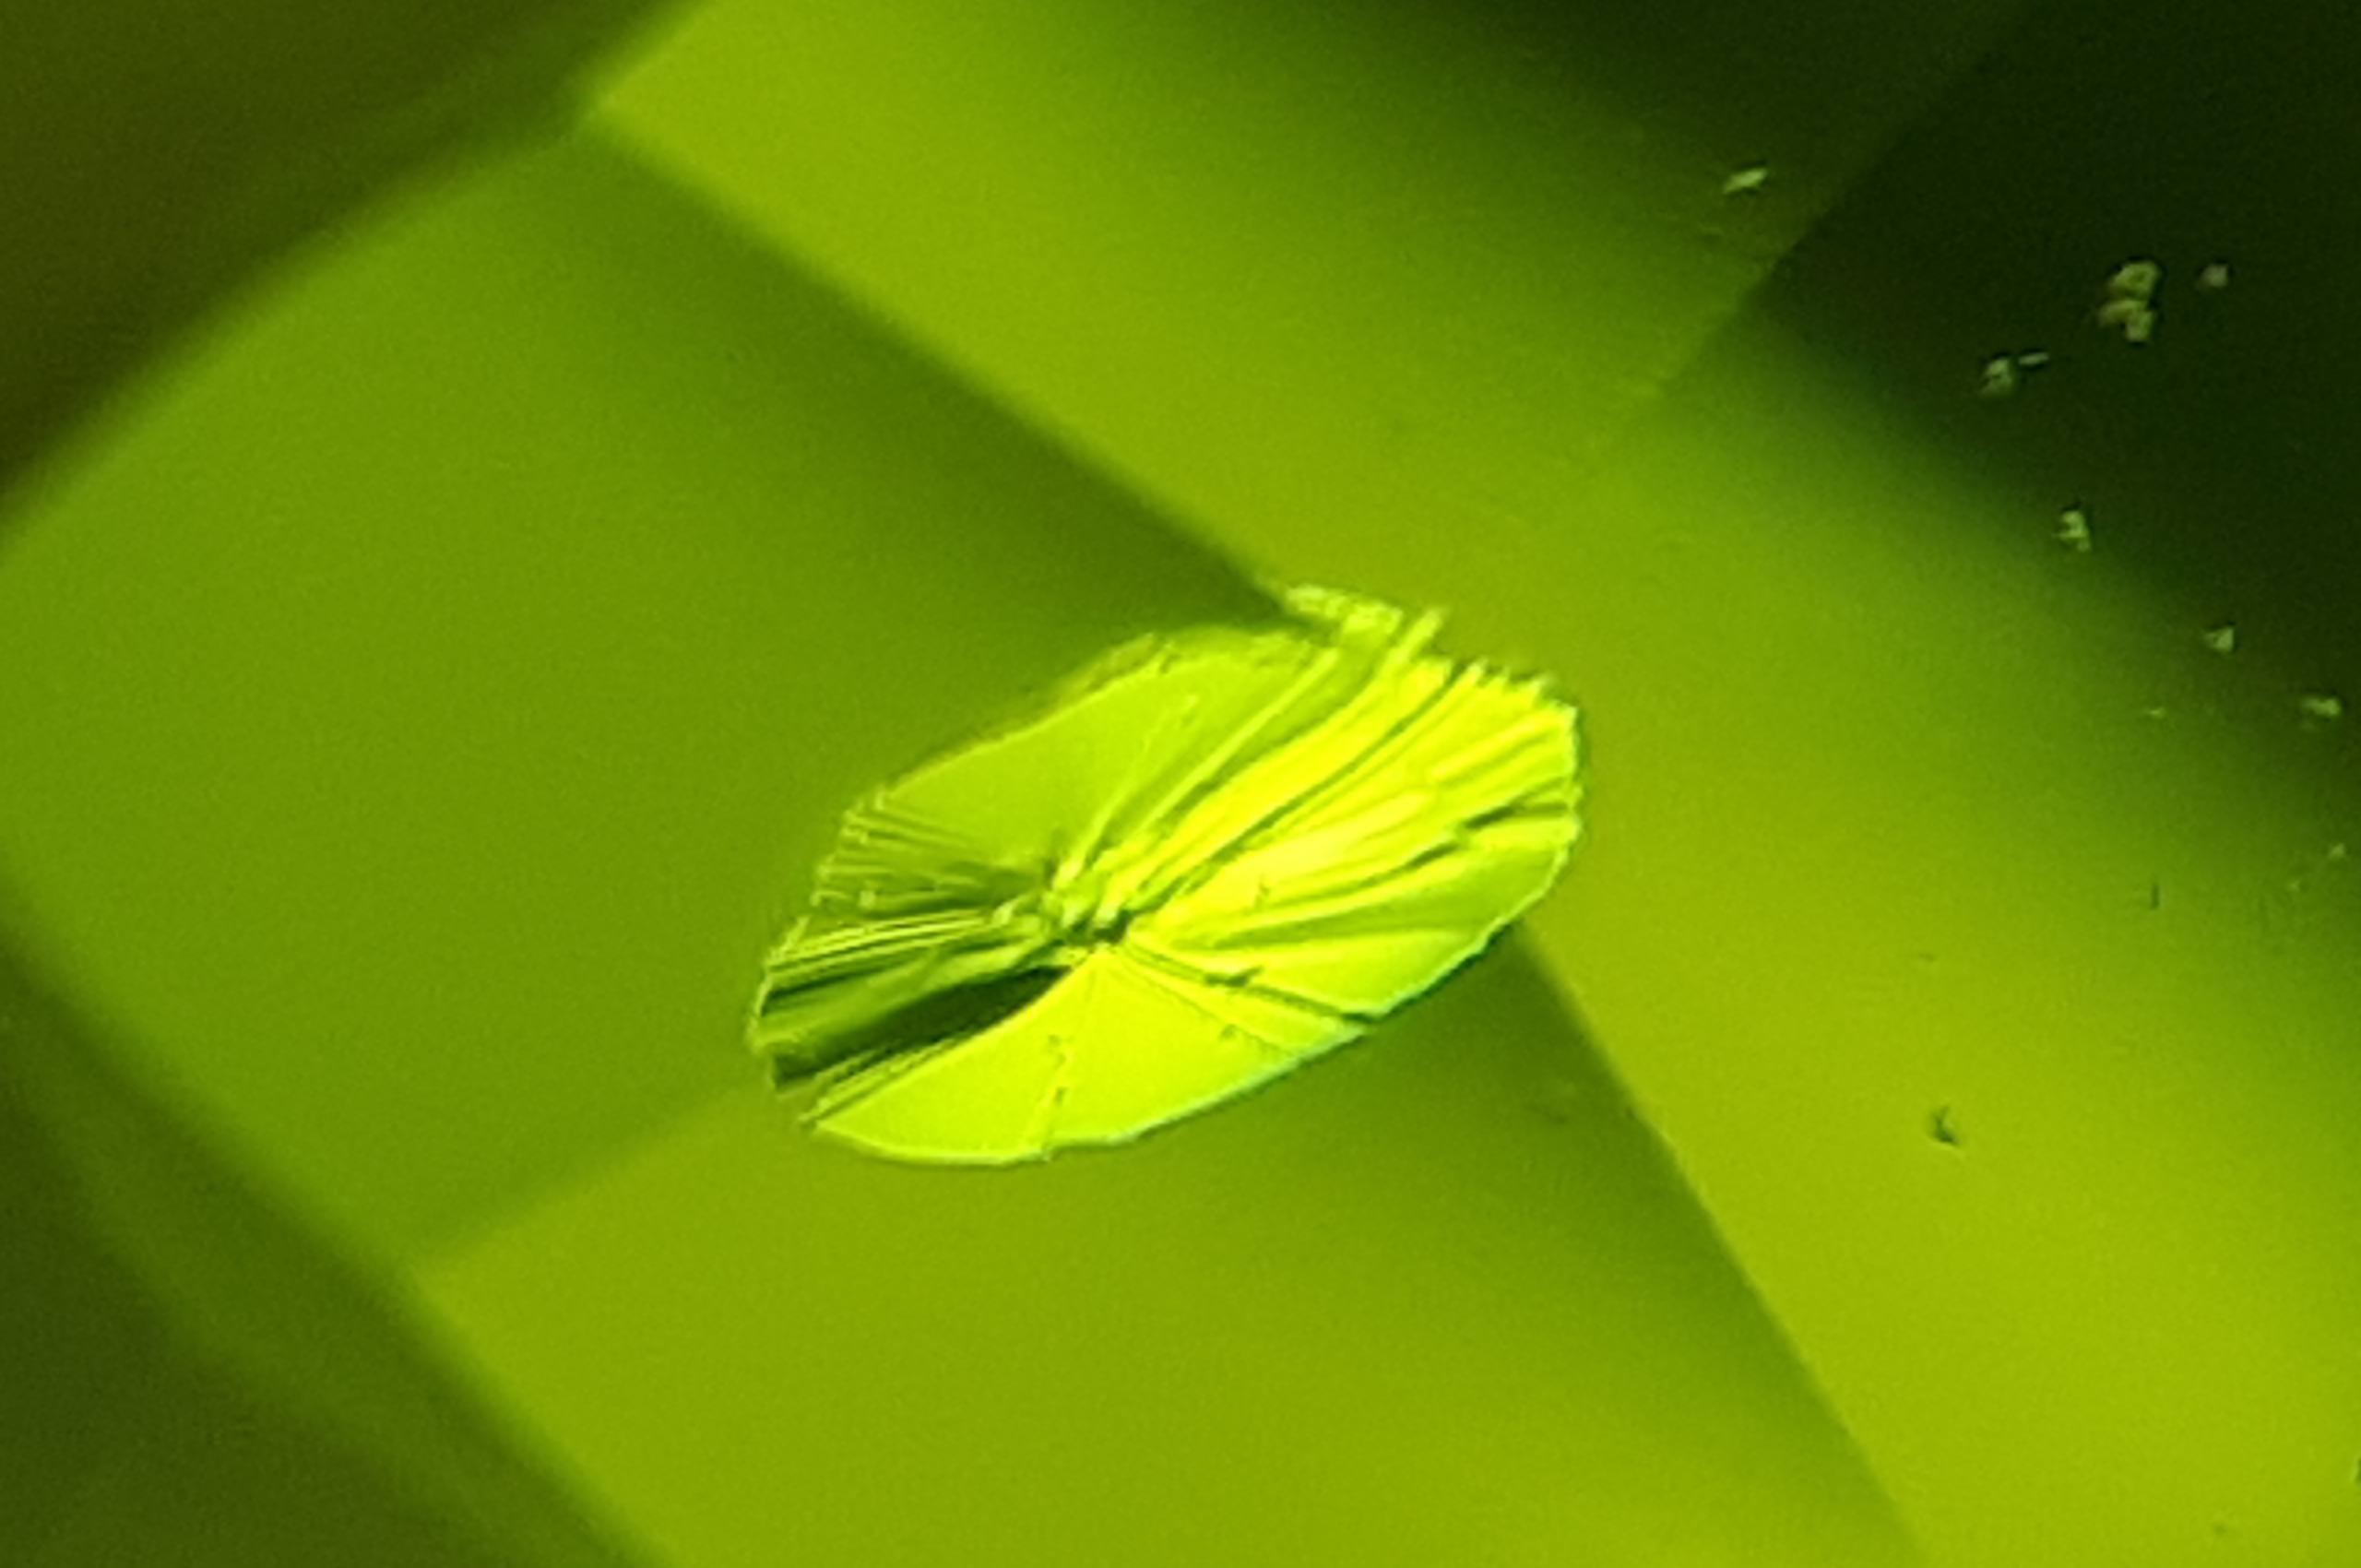 Lily pad inclusion in Peridot - Photo by Igor Bolotovski